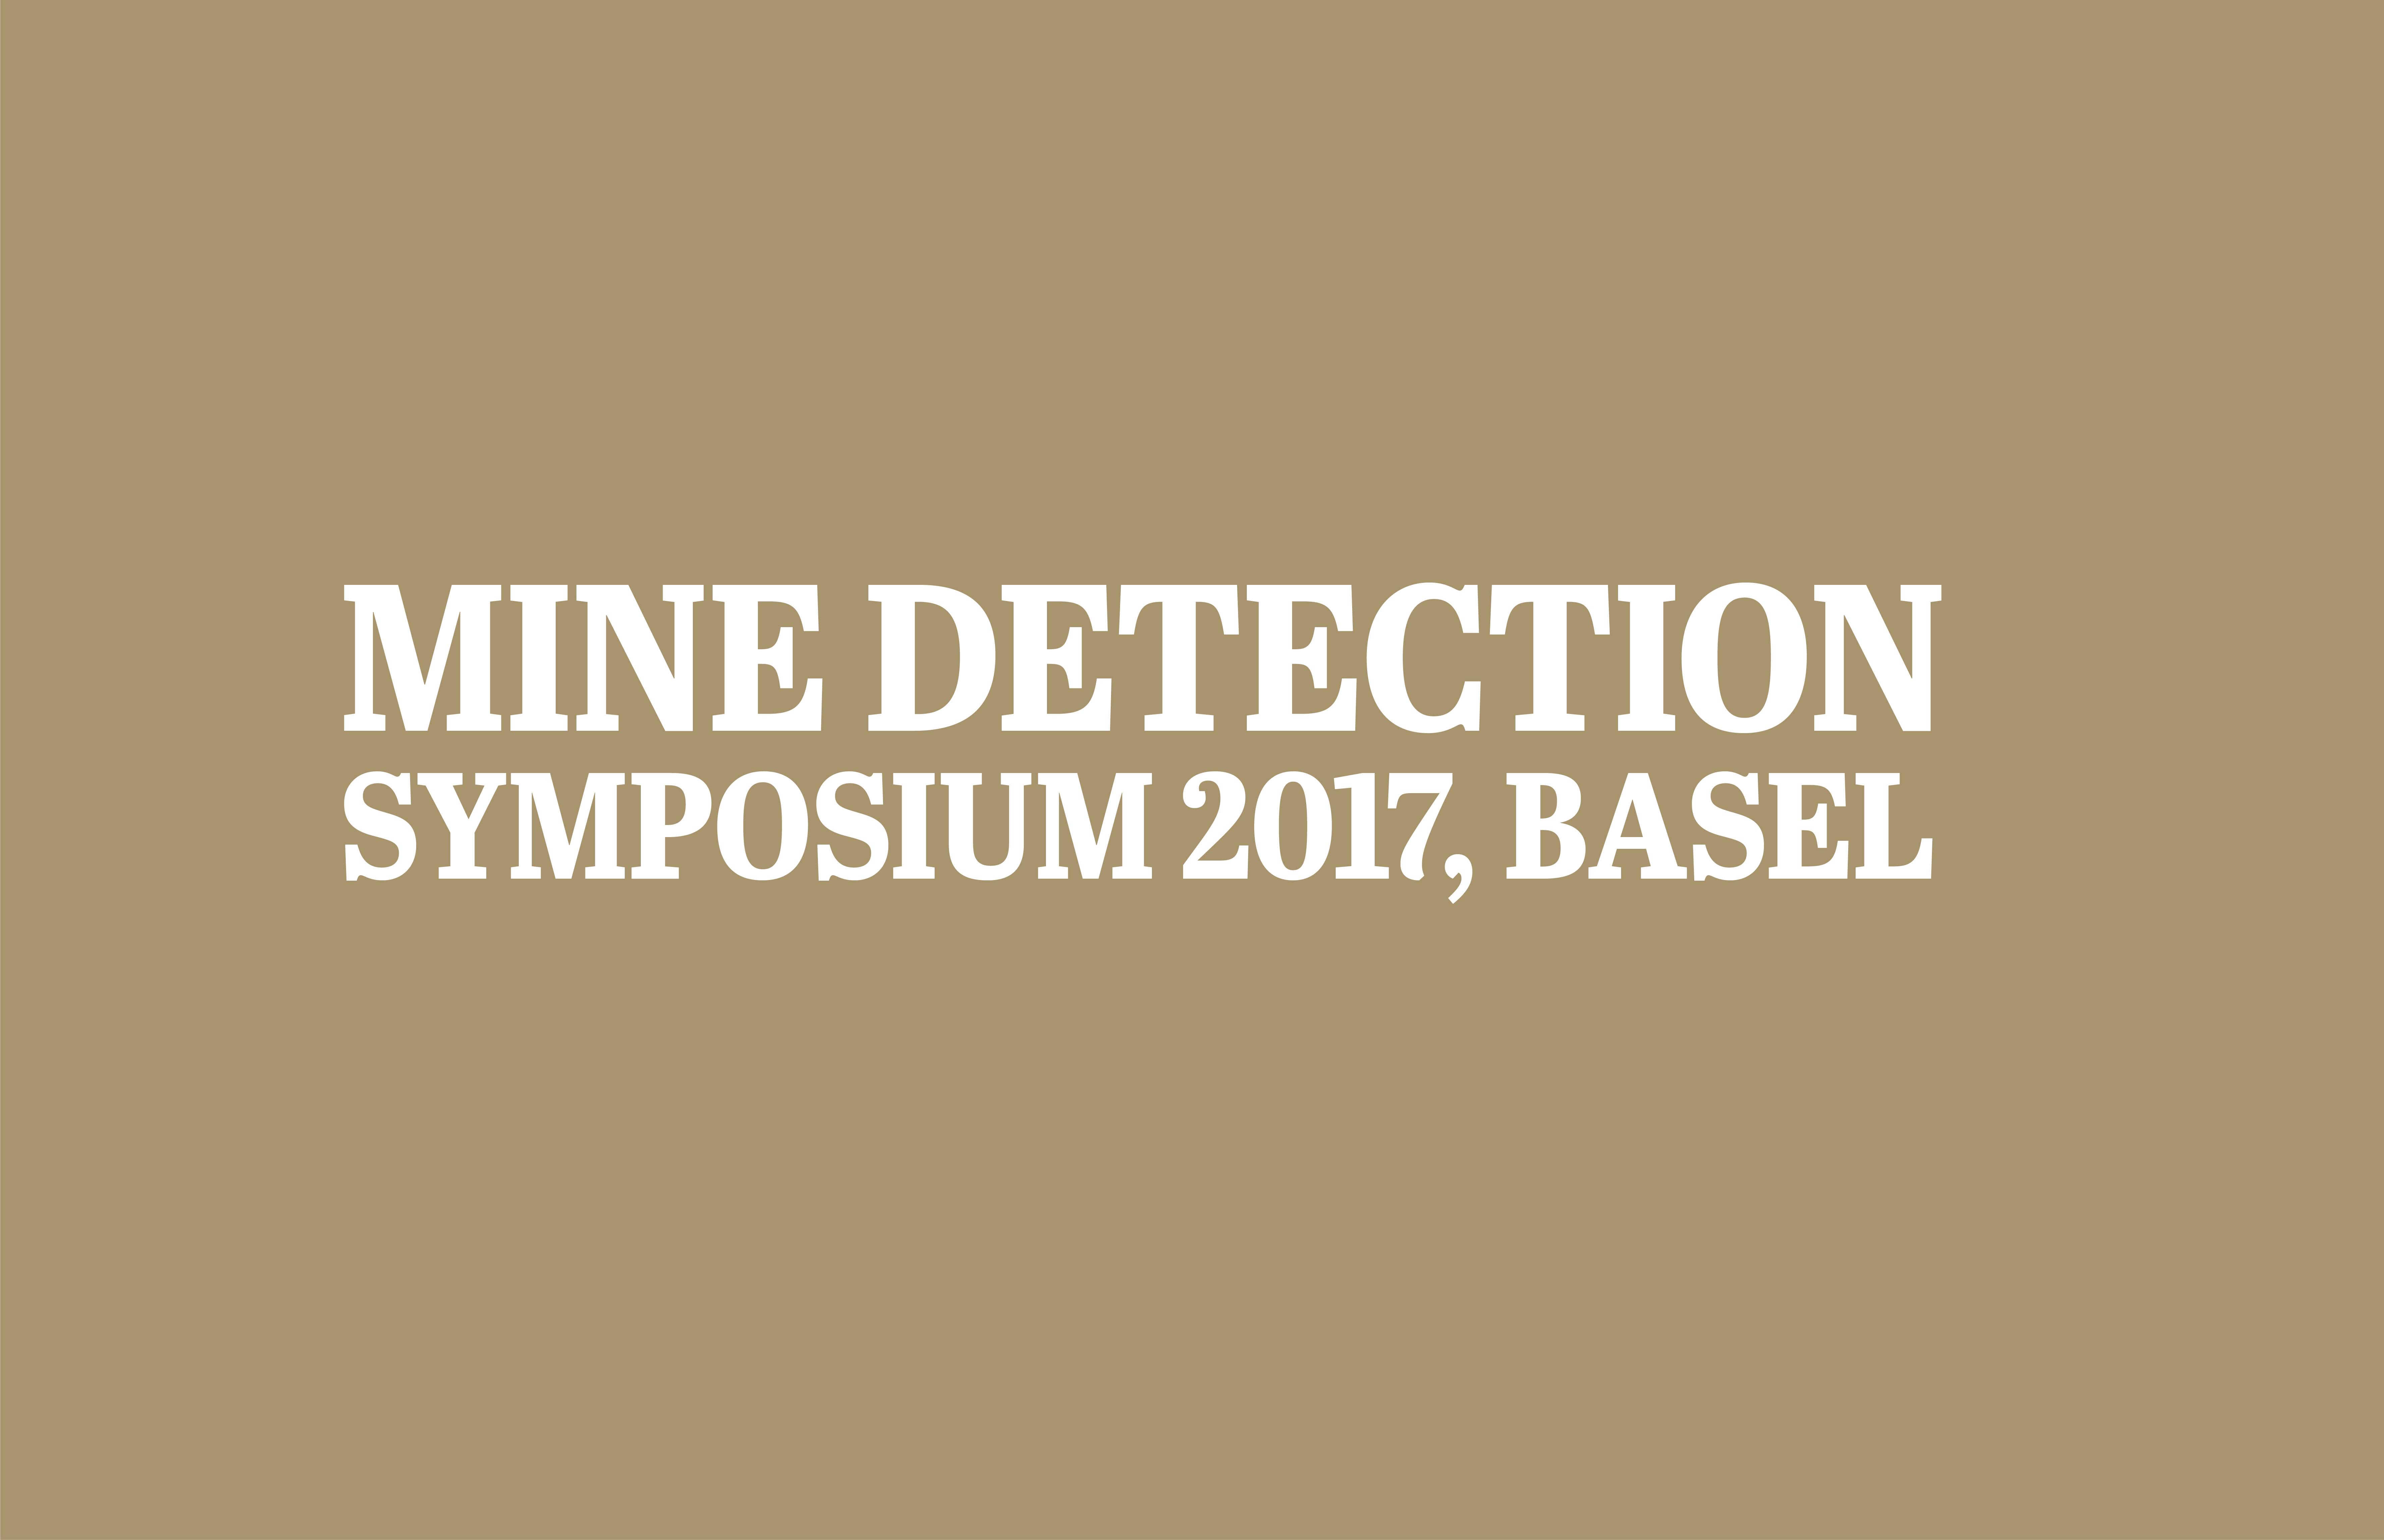 Mine detection Symposium 2017